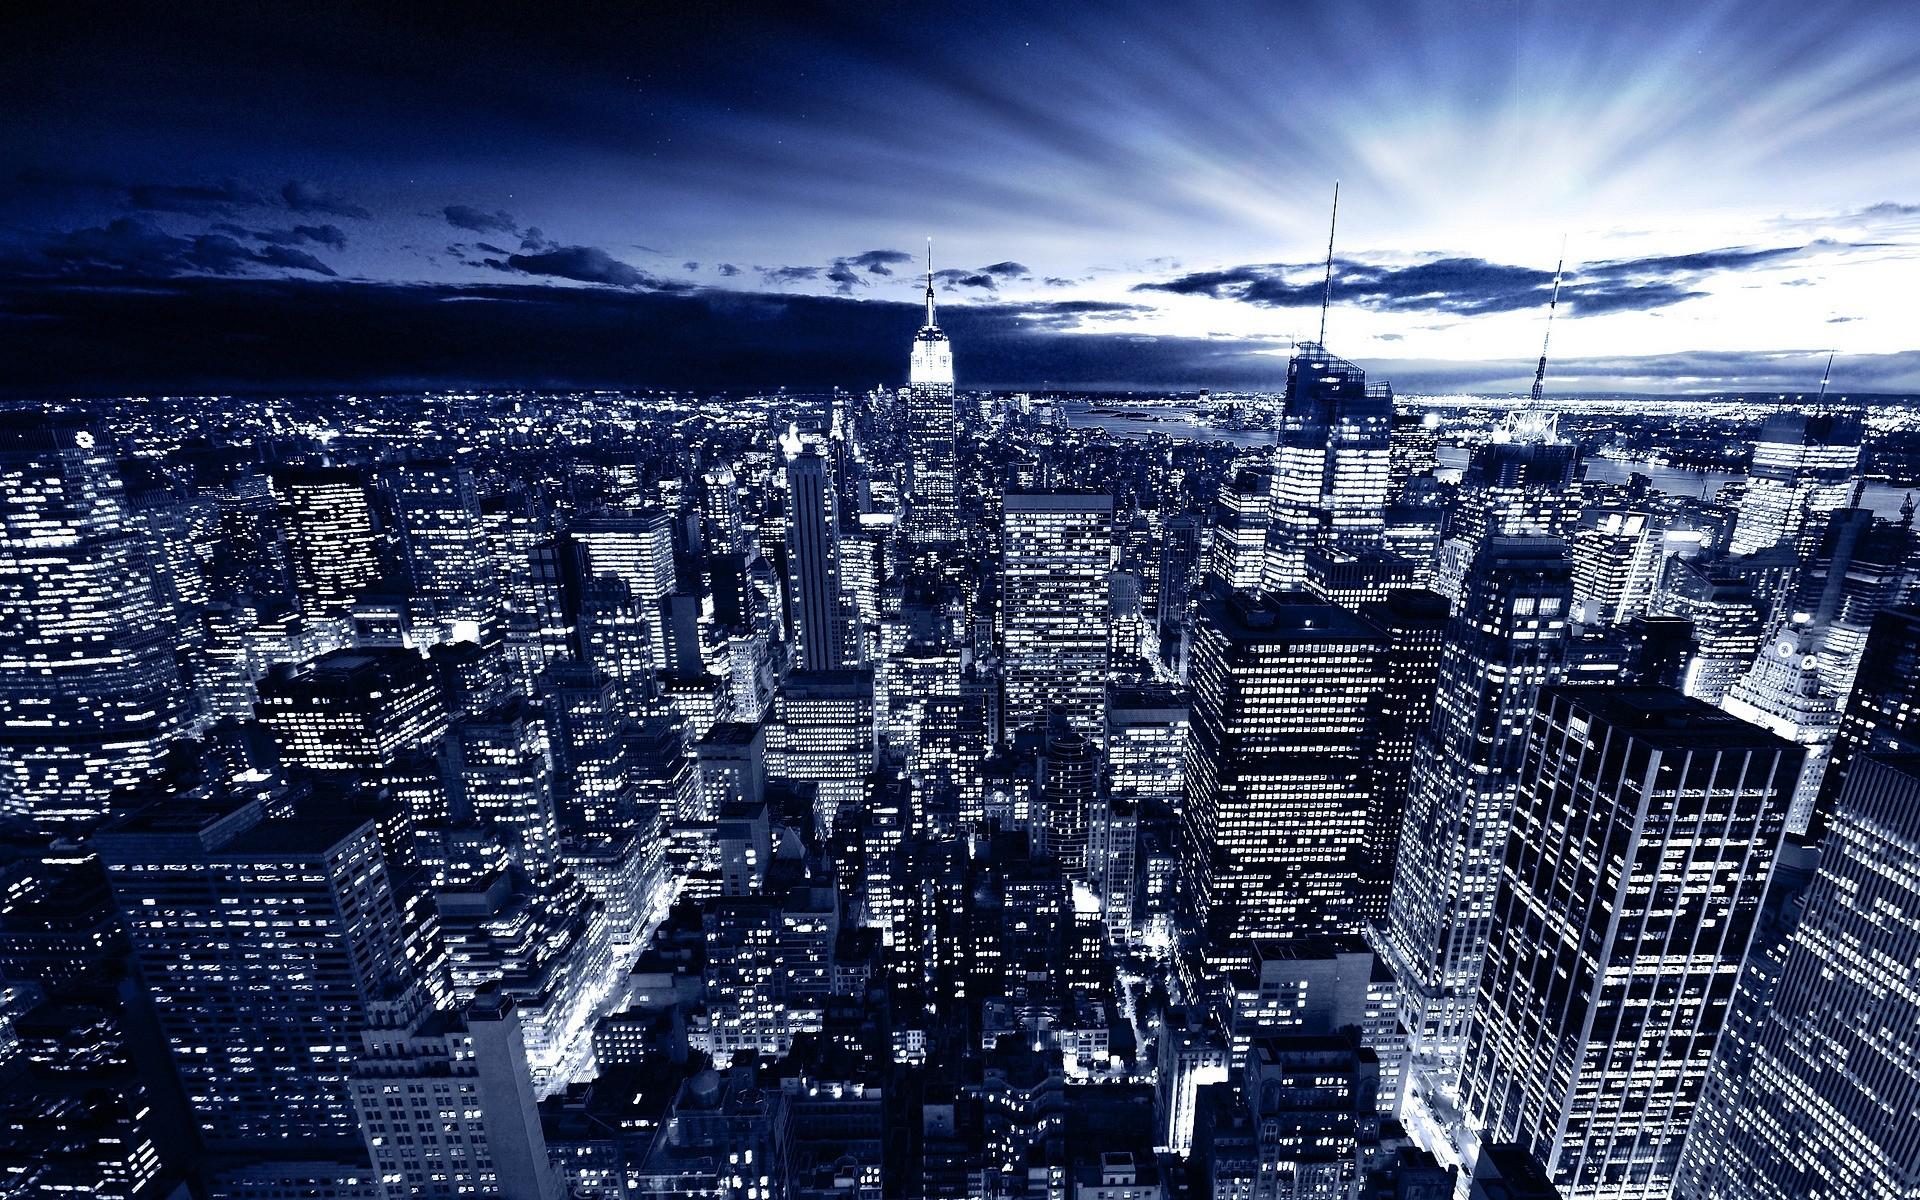 New York Digital Photo Wallpaper